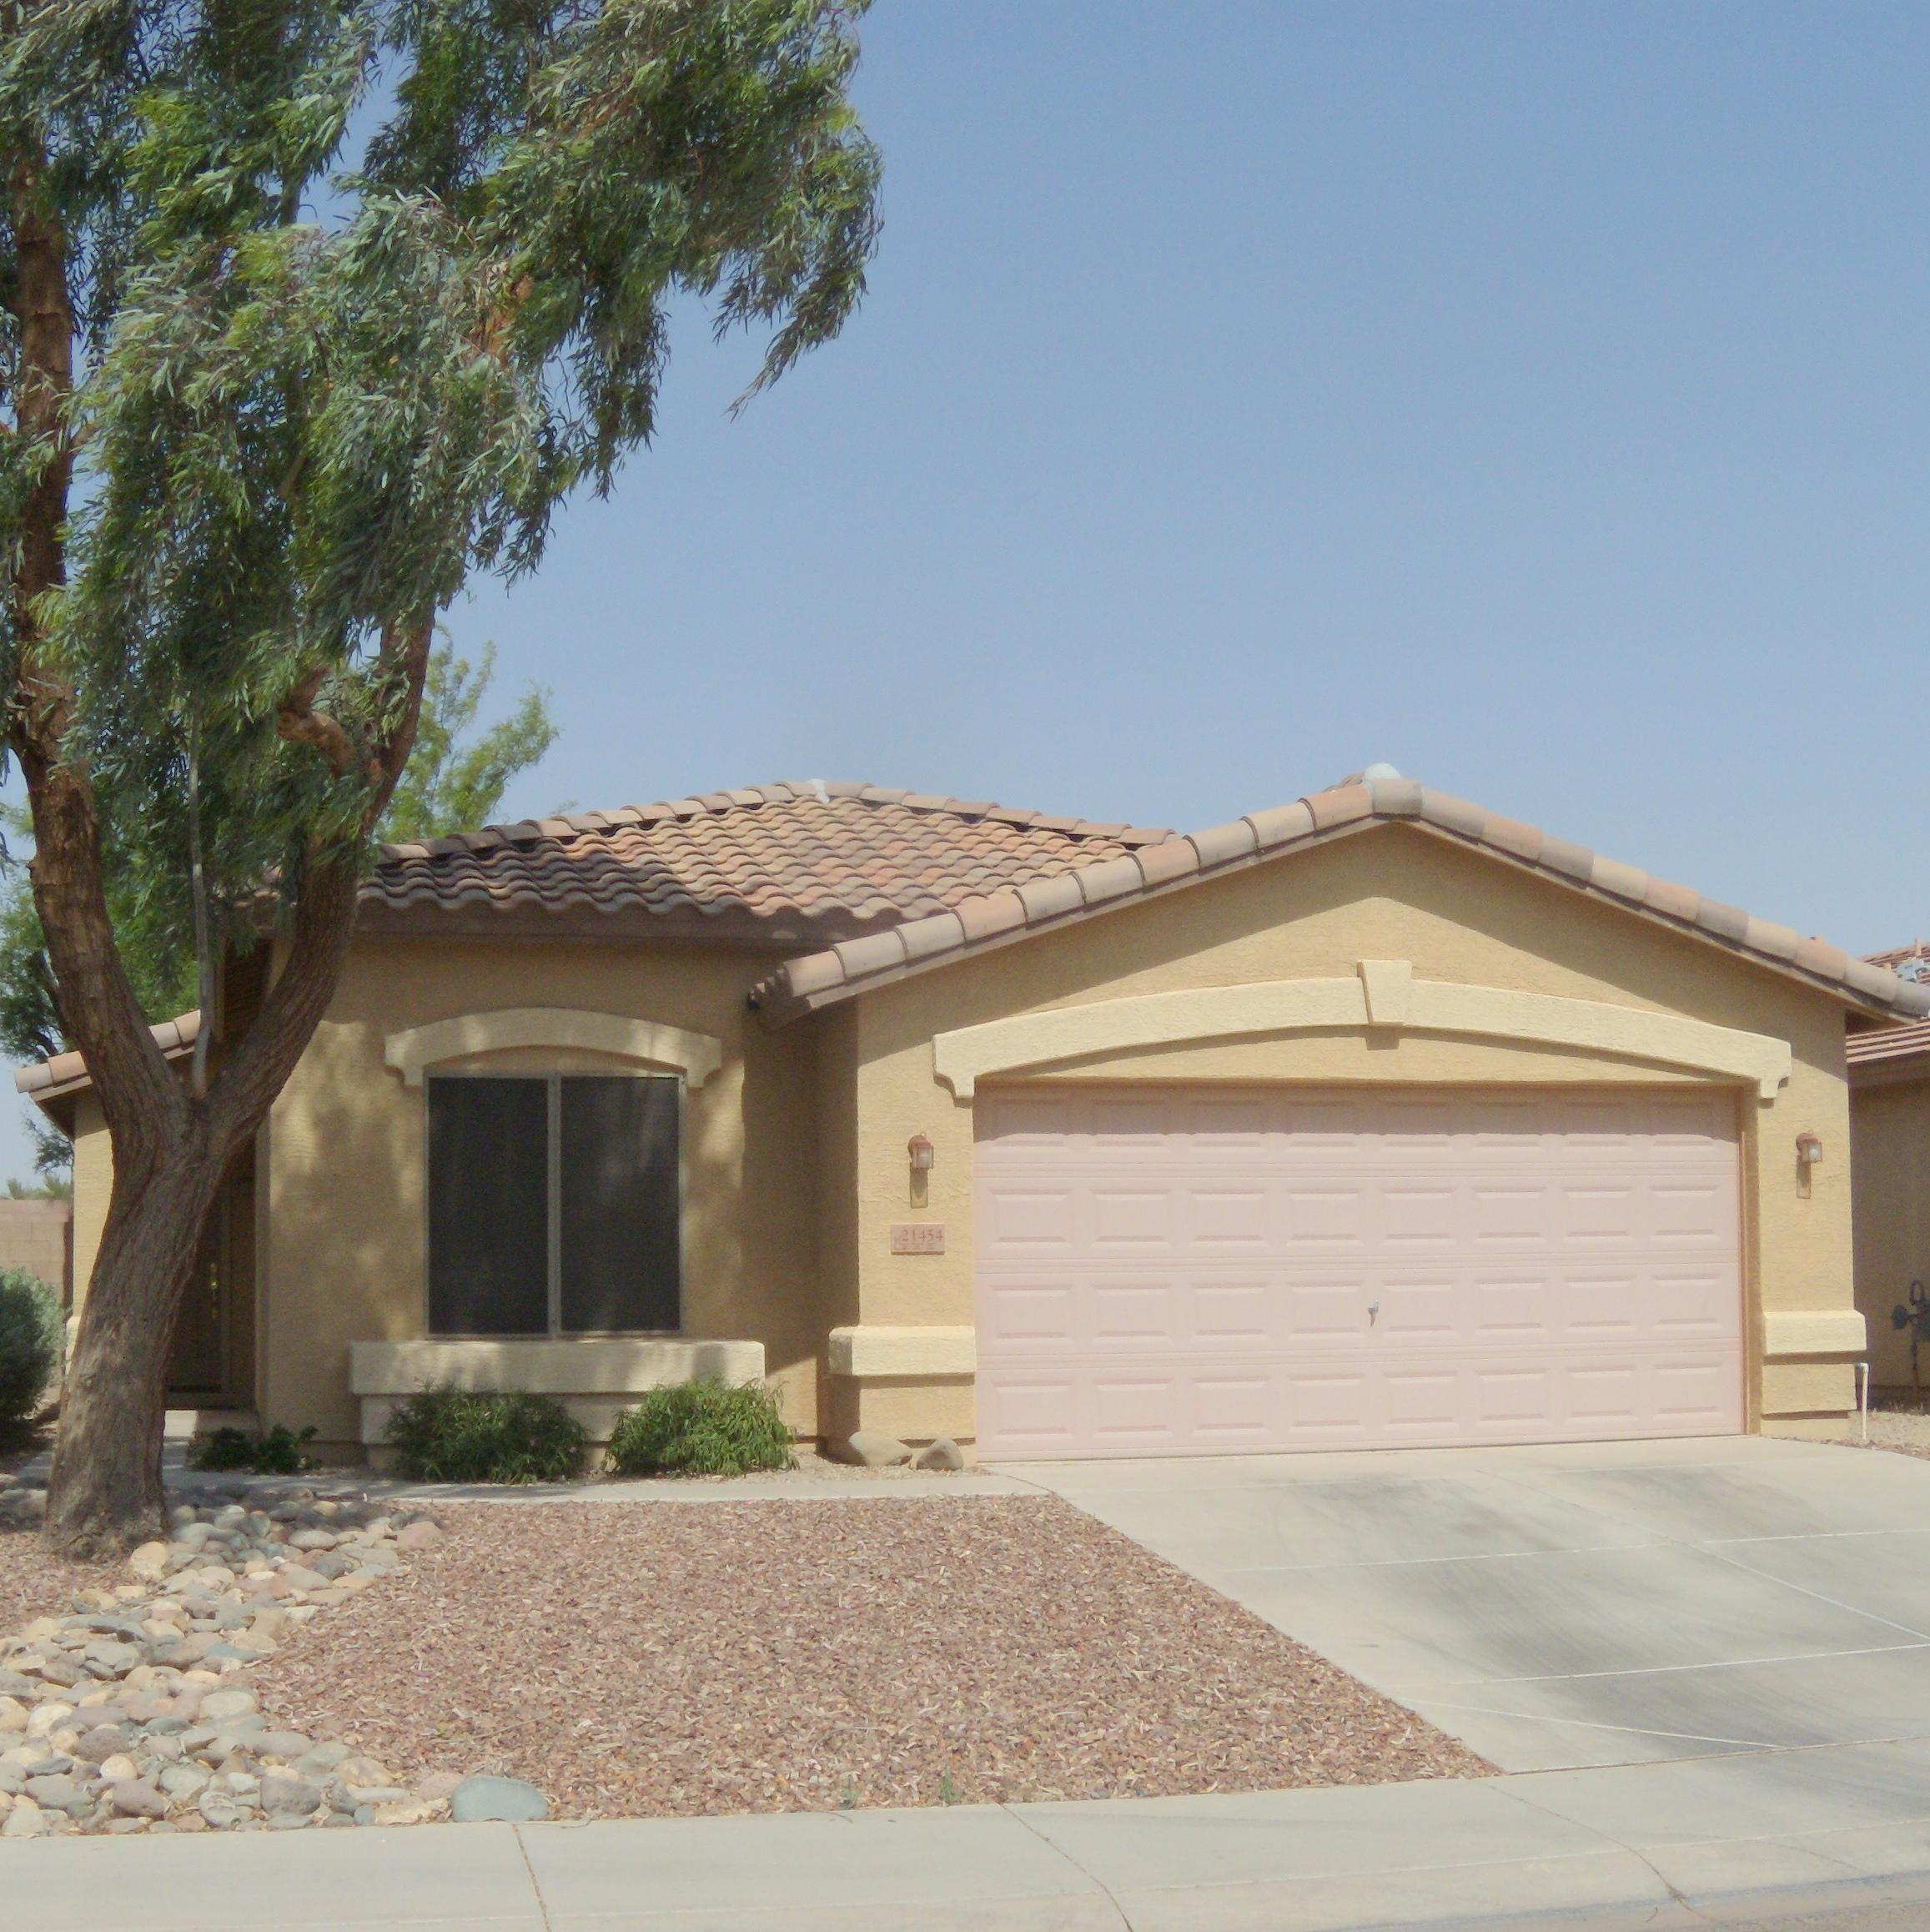 21454 N Duncan Dr,Maricopa,AZ